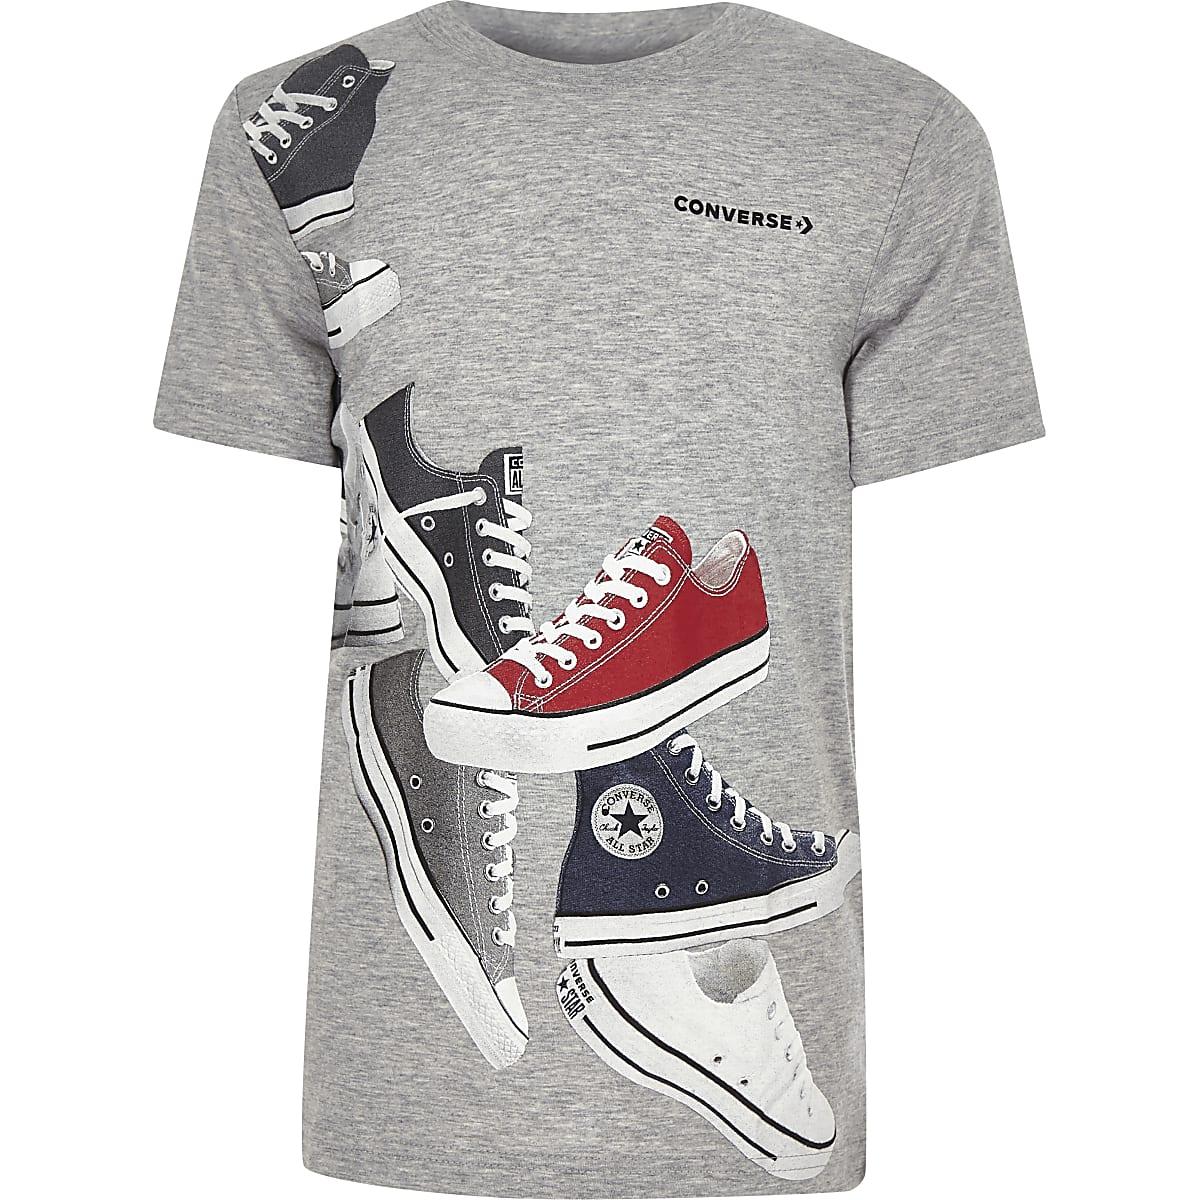 01af7e347987c5 Boys Converse grey print T-shirt - T-shirts - T-Shirts   Vests - boys